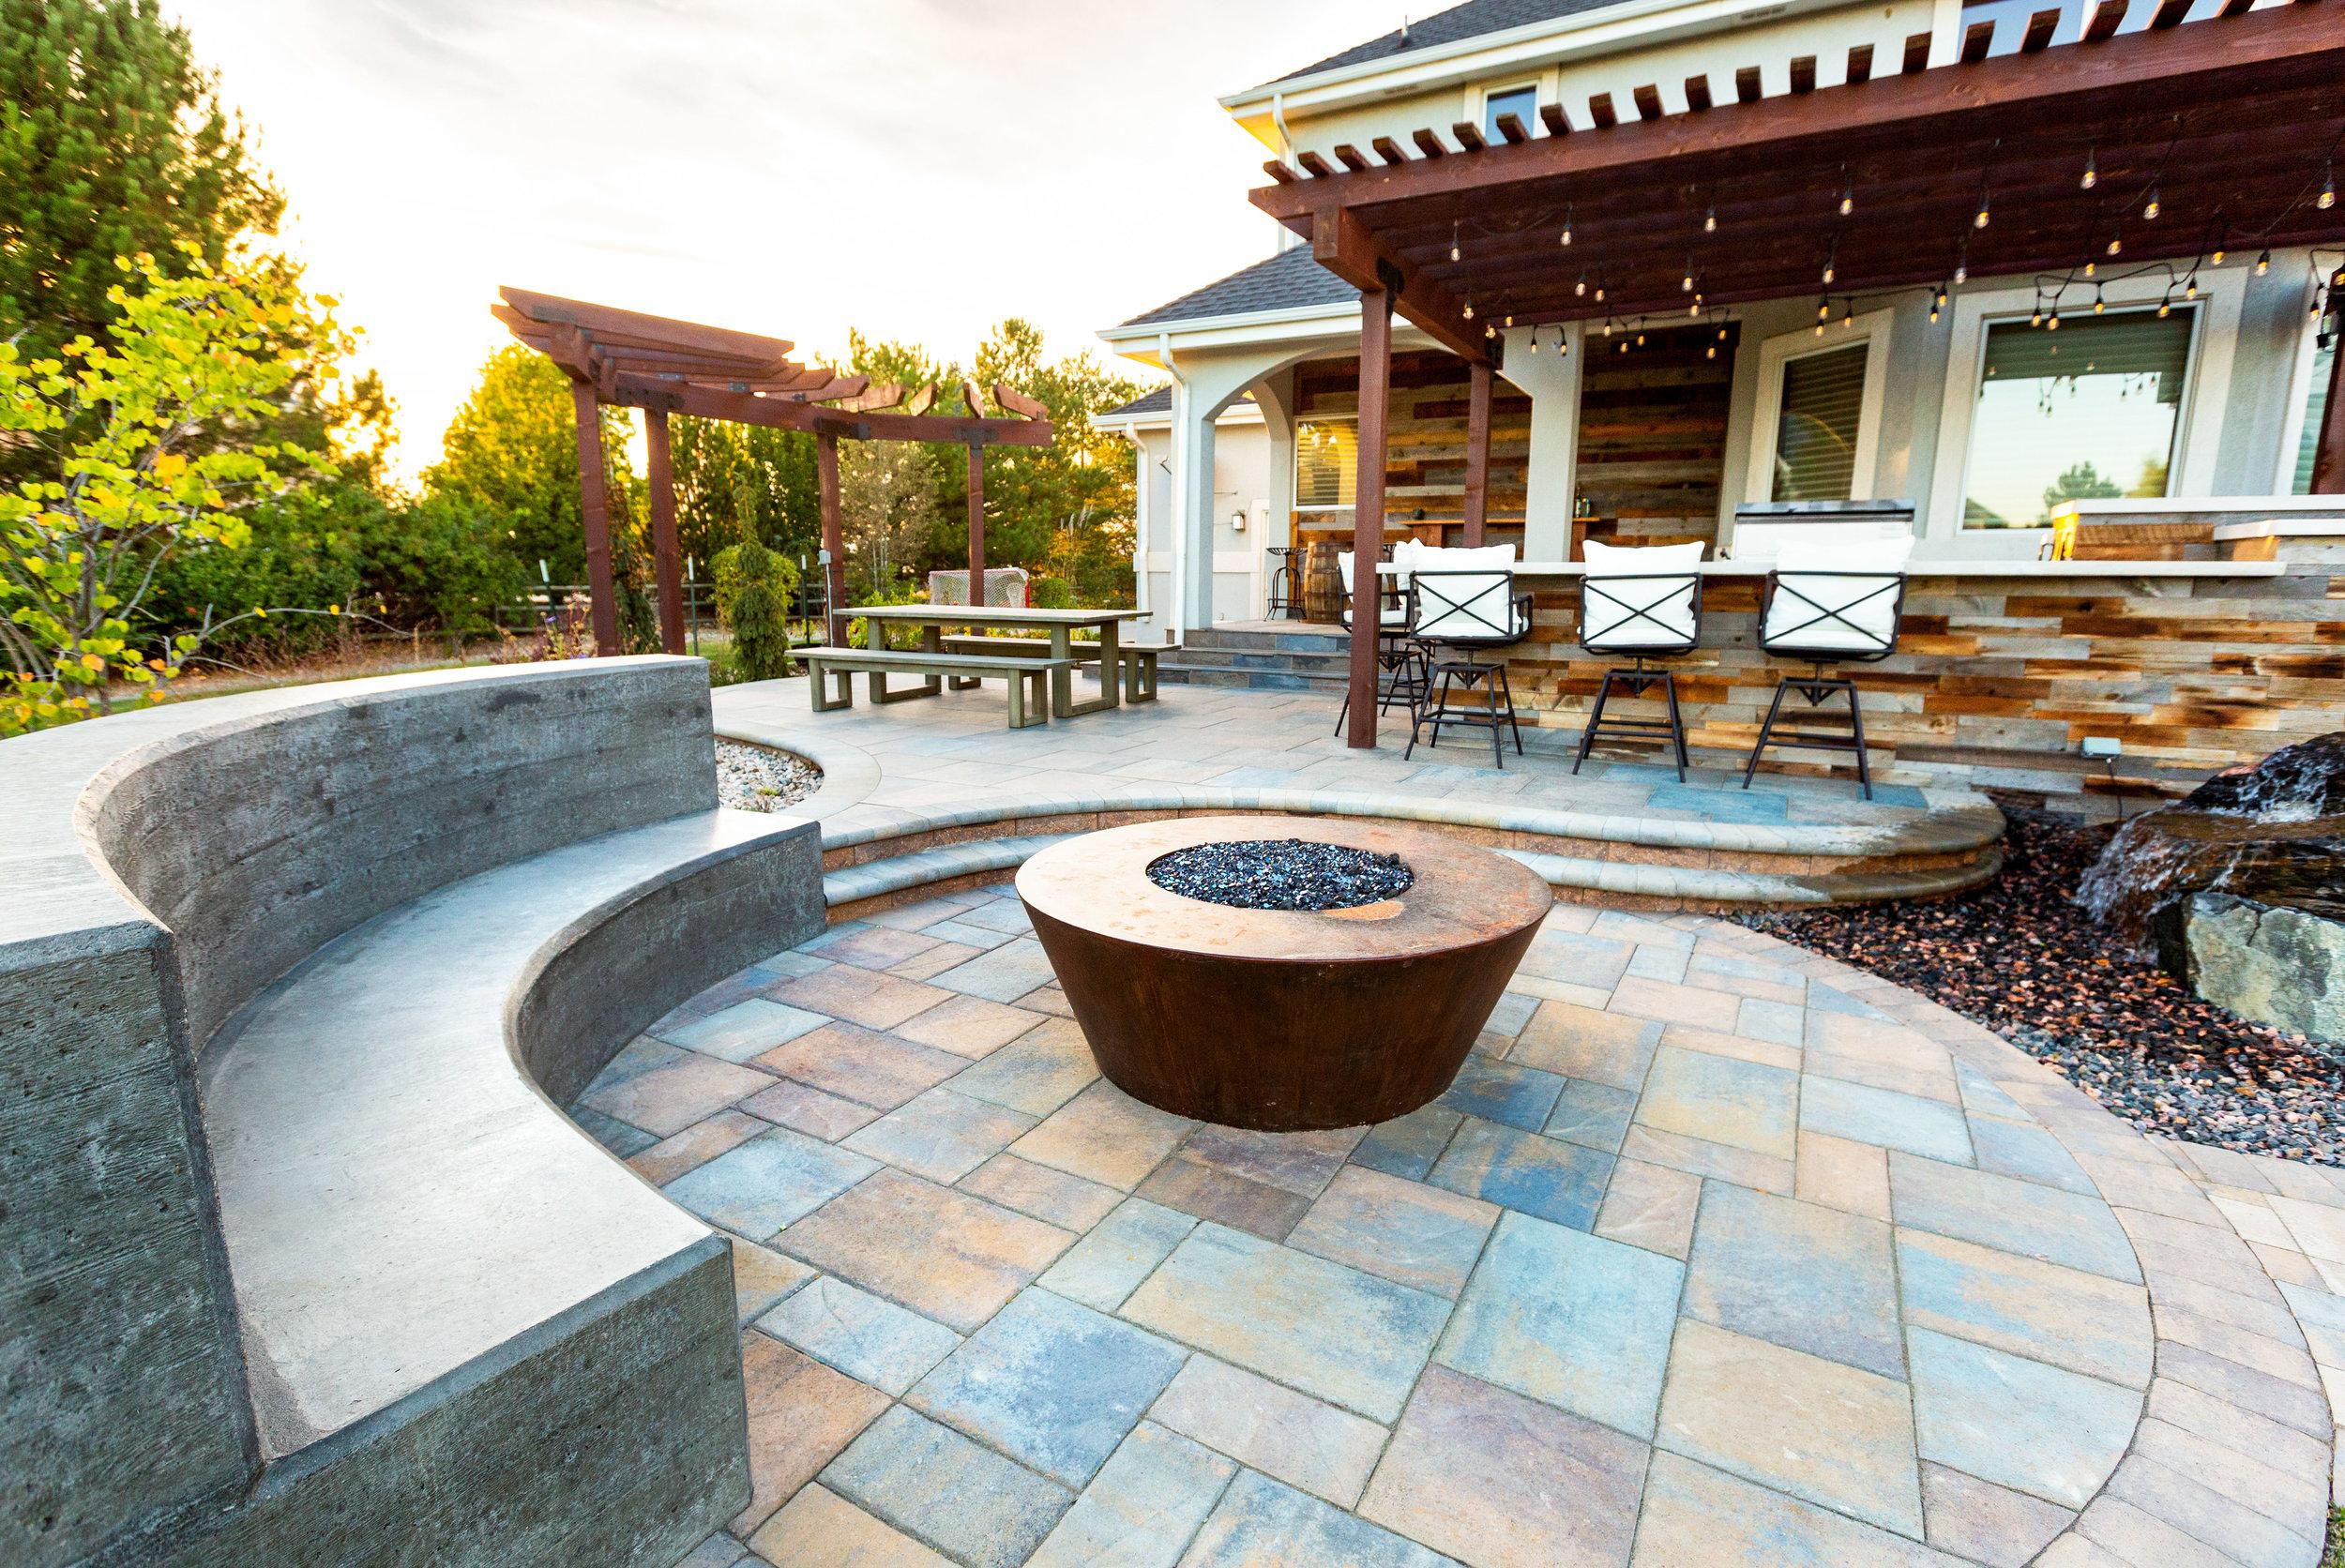 Zak George Landscaping - Residential Landscape Design & Install-16.jpg